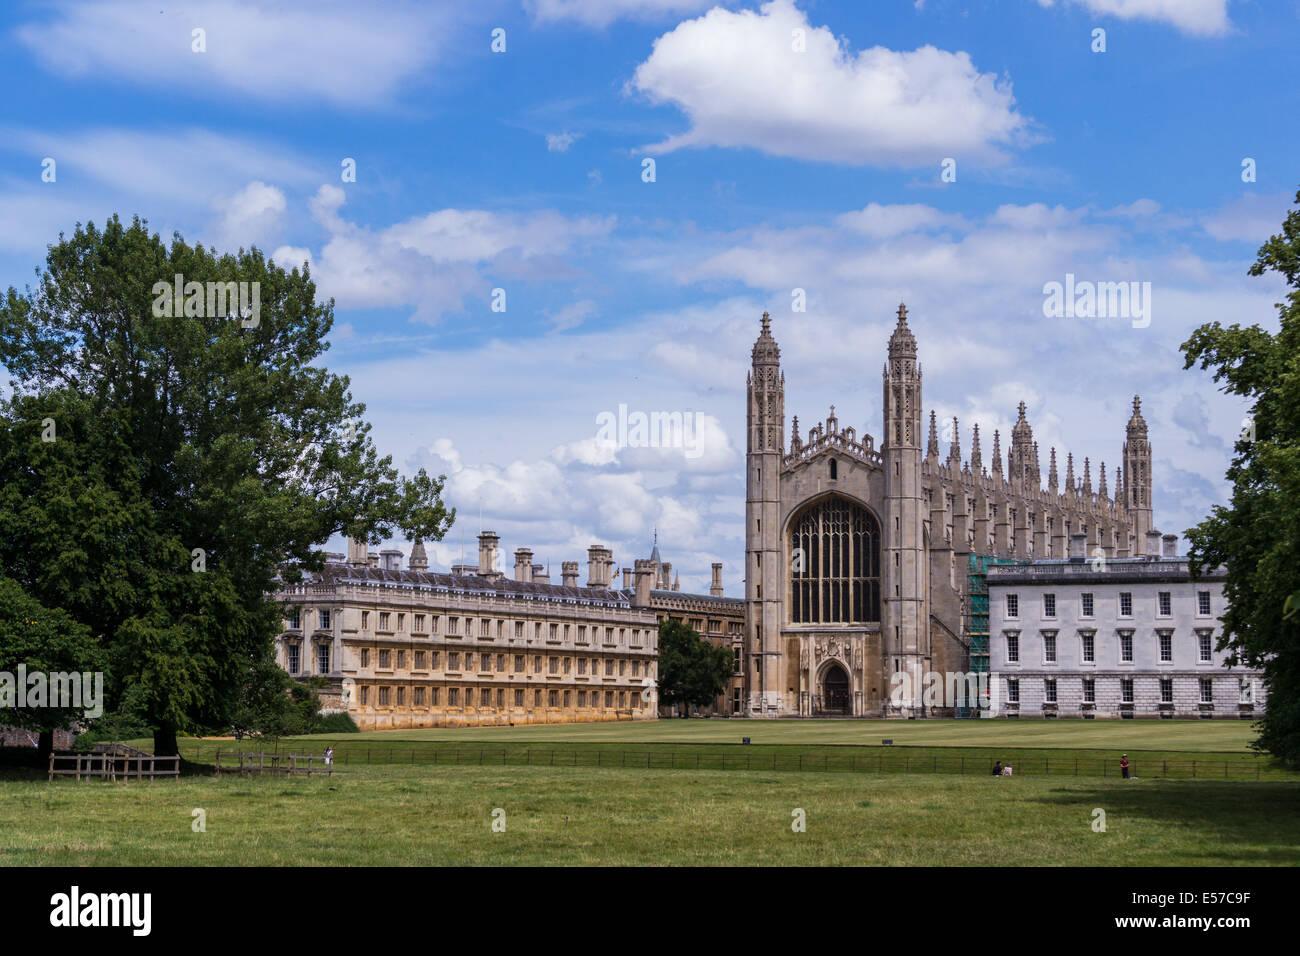 King's College, Cambridge, UK - Stock Image